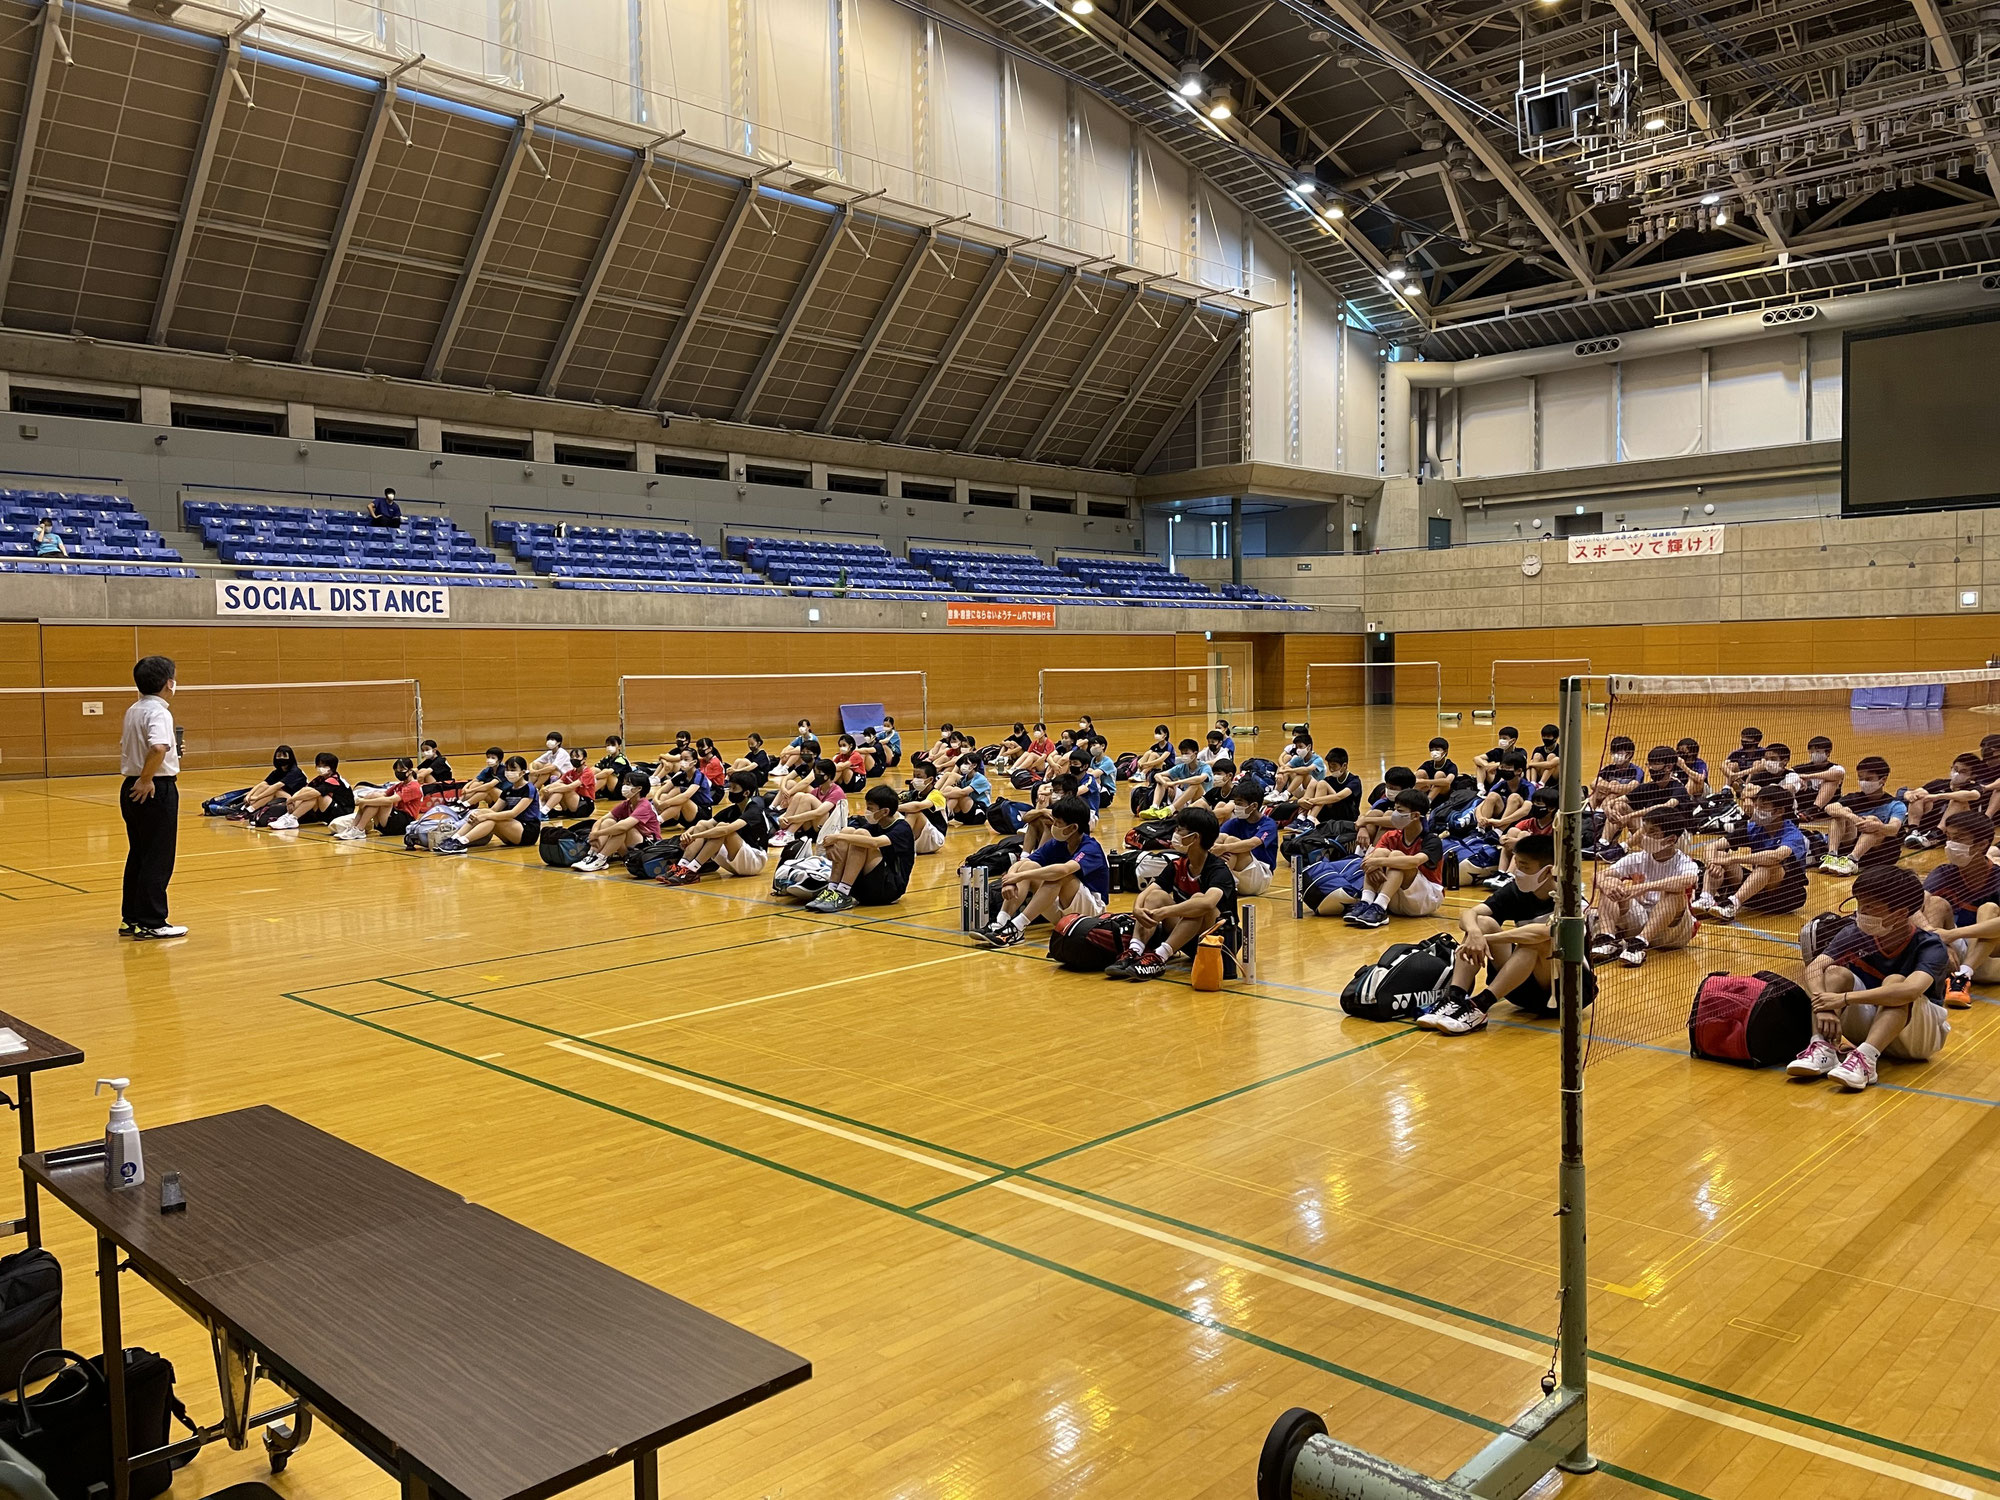 千葉県中学生バドミントン強化練習会♪